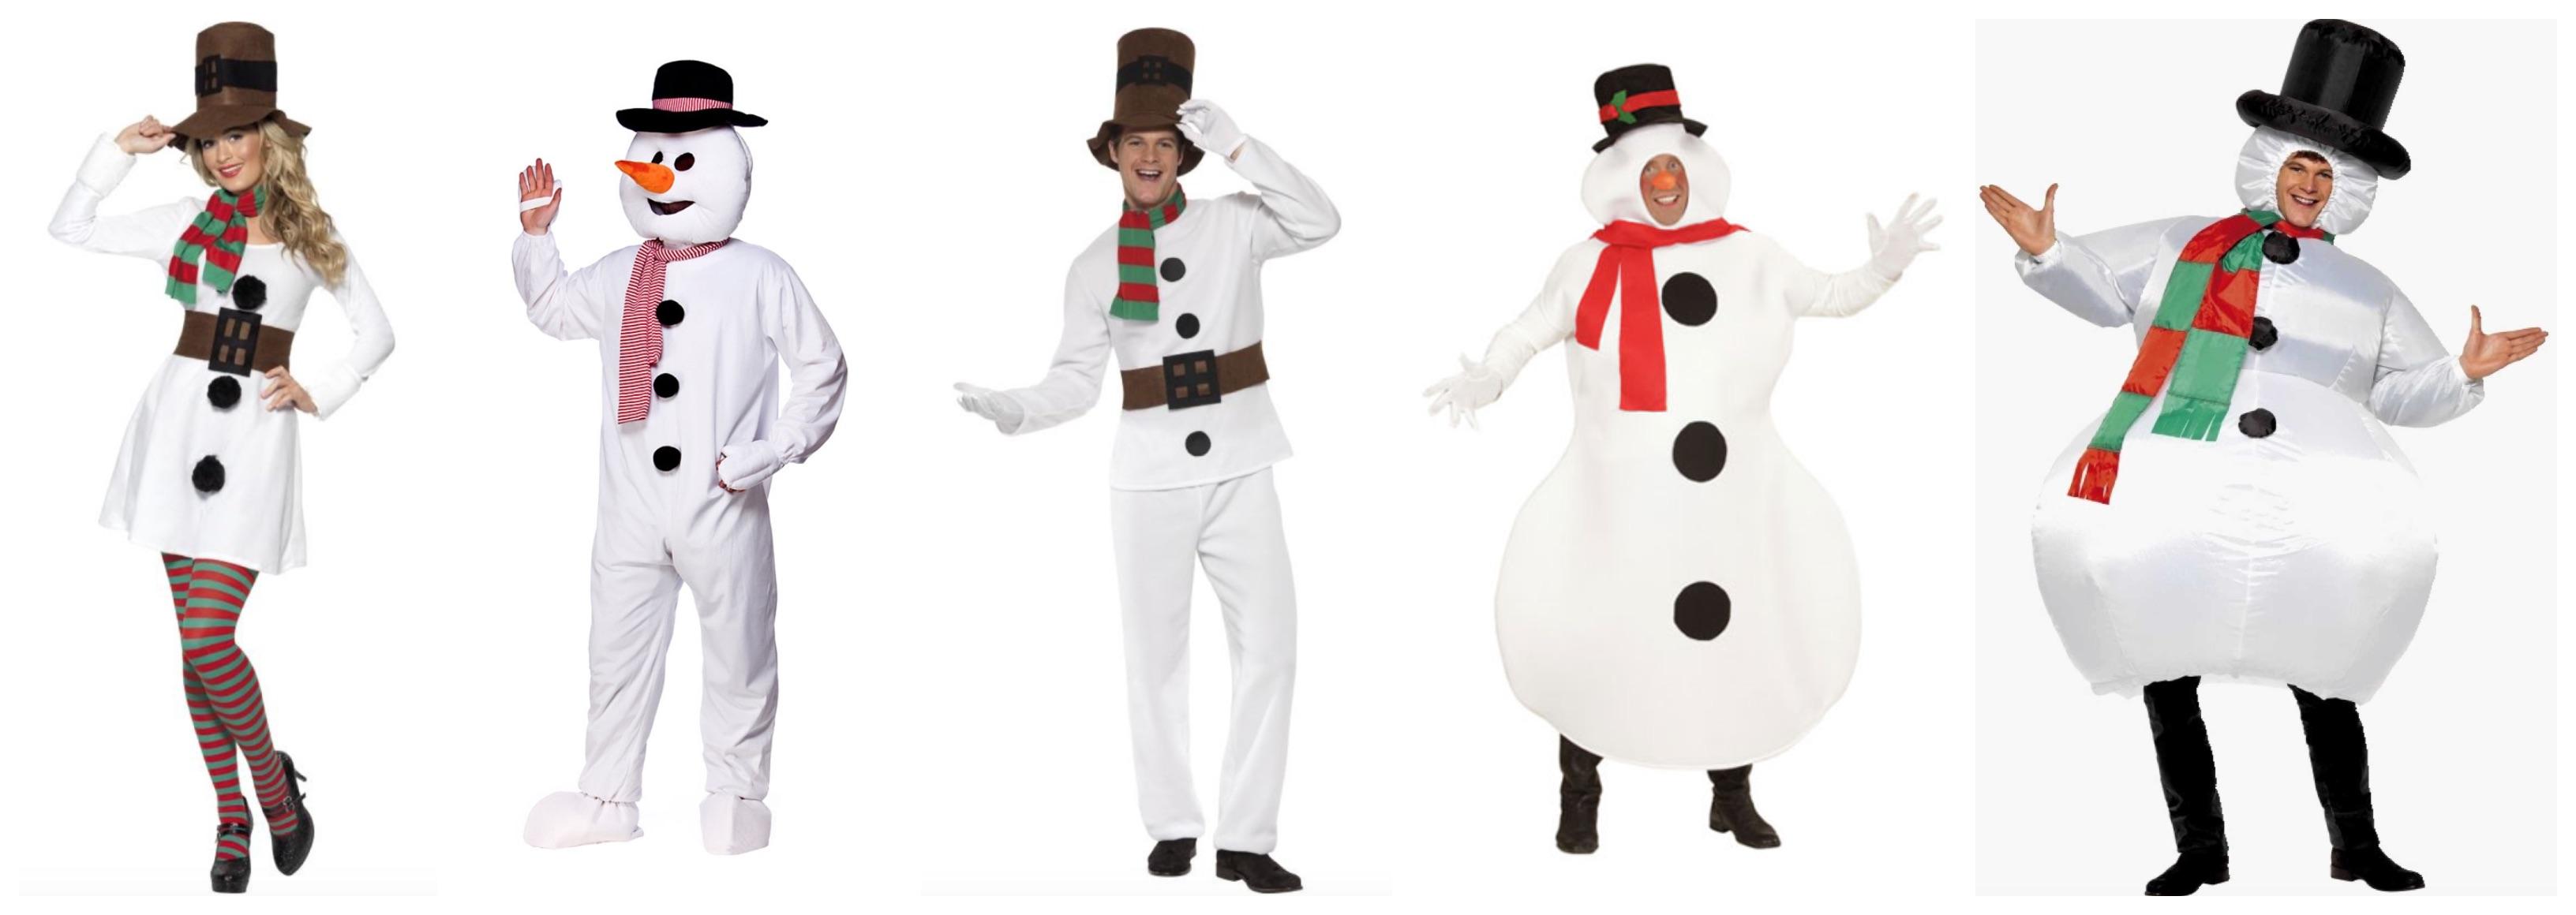 snemand kostume til voksne - Snemand kostume til voksne